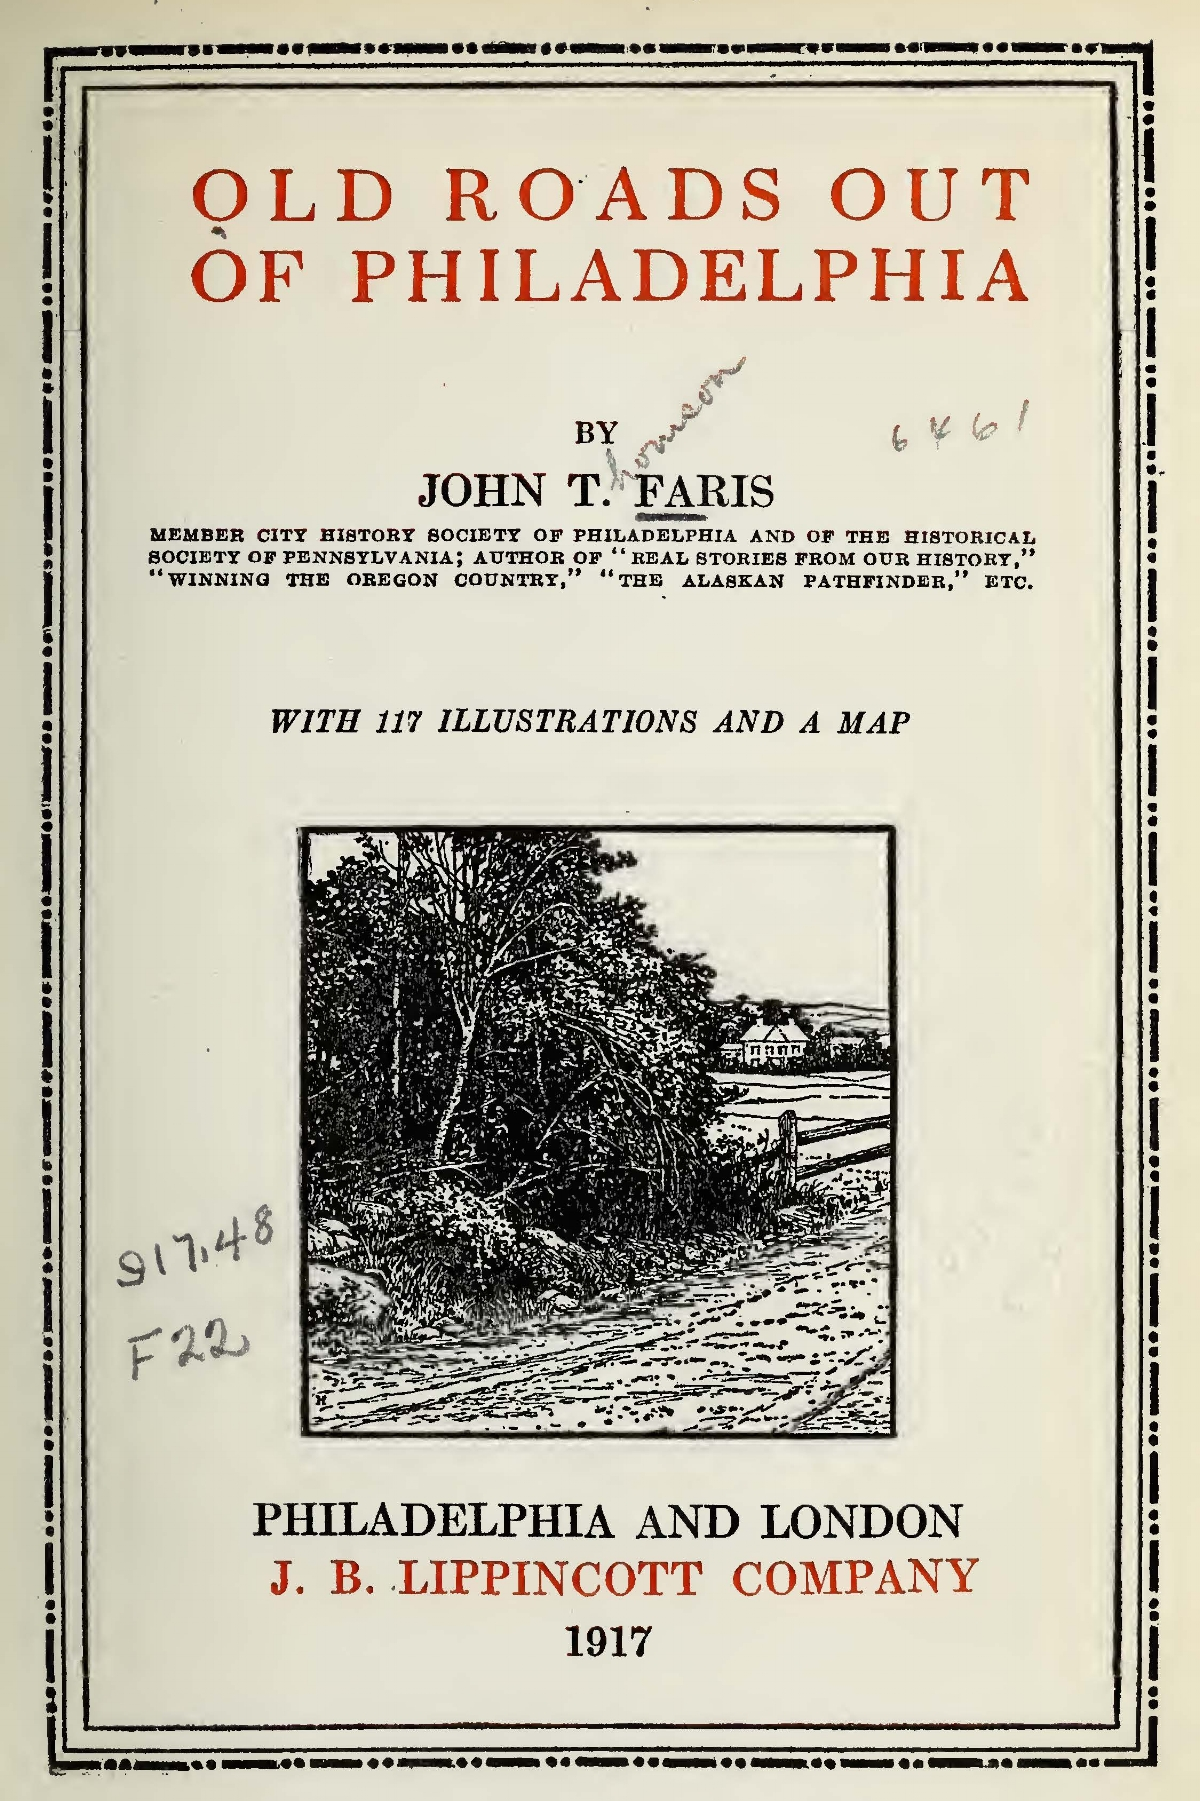 Faris, John Thomson, Old Roads Out of Philadelphia Title Page.jpg